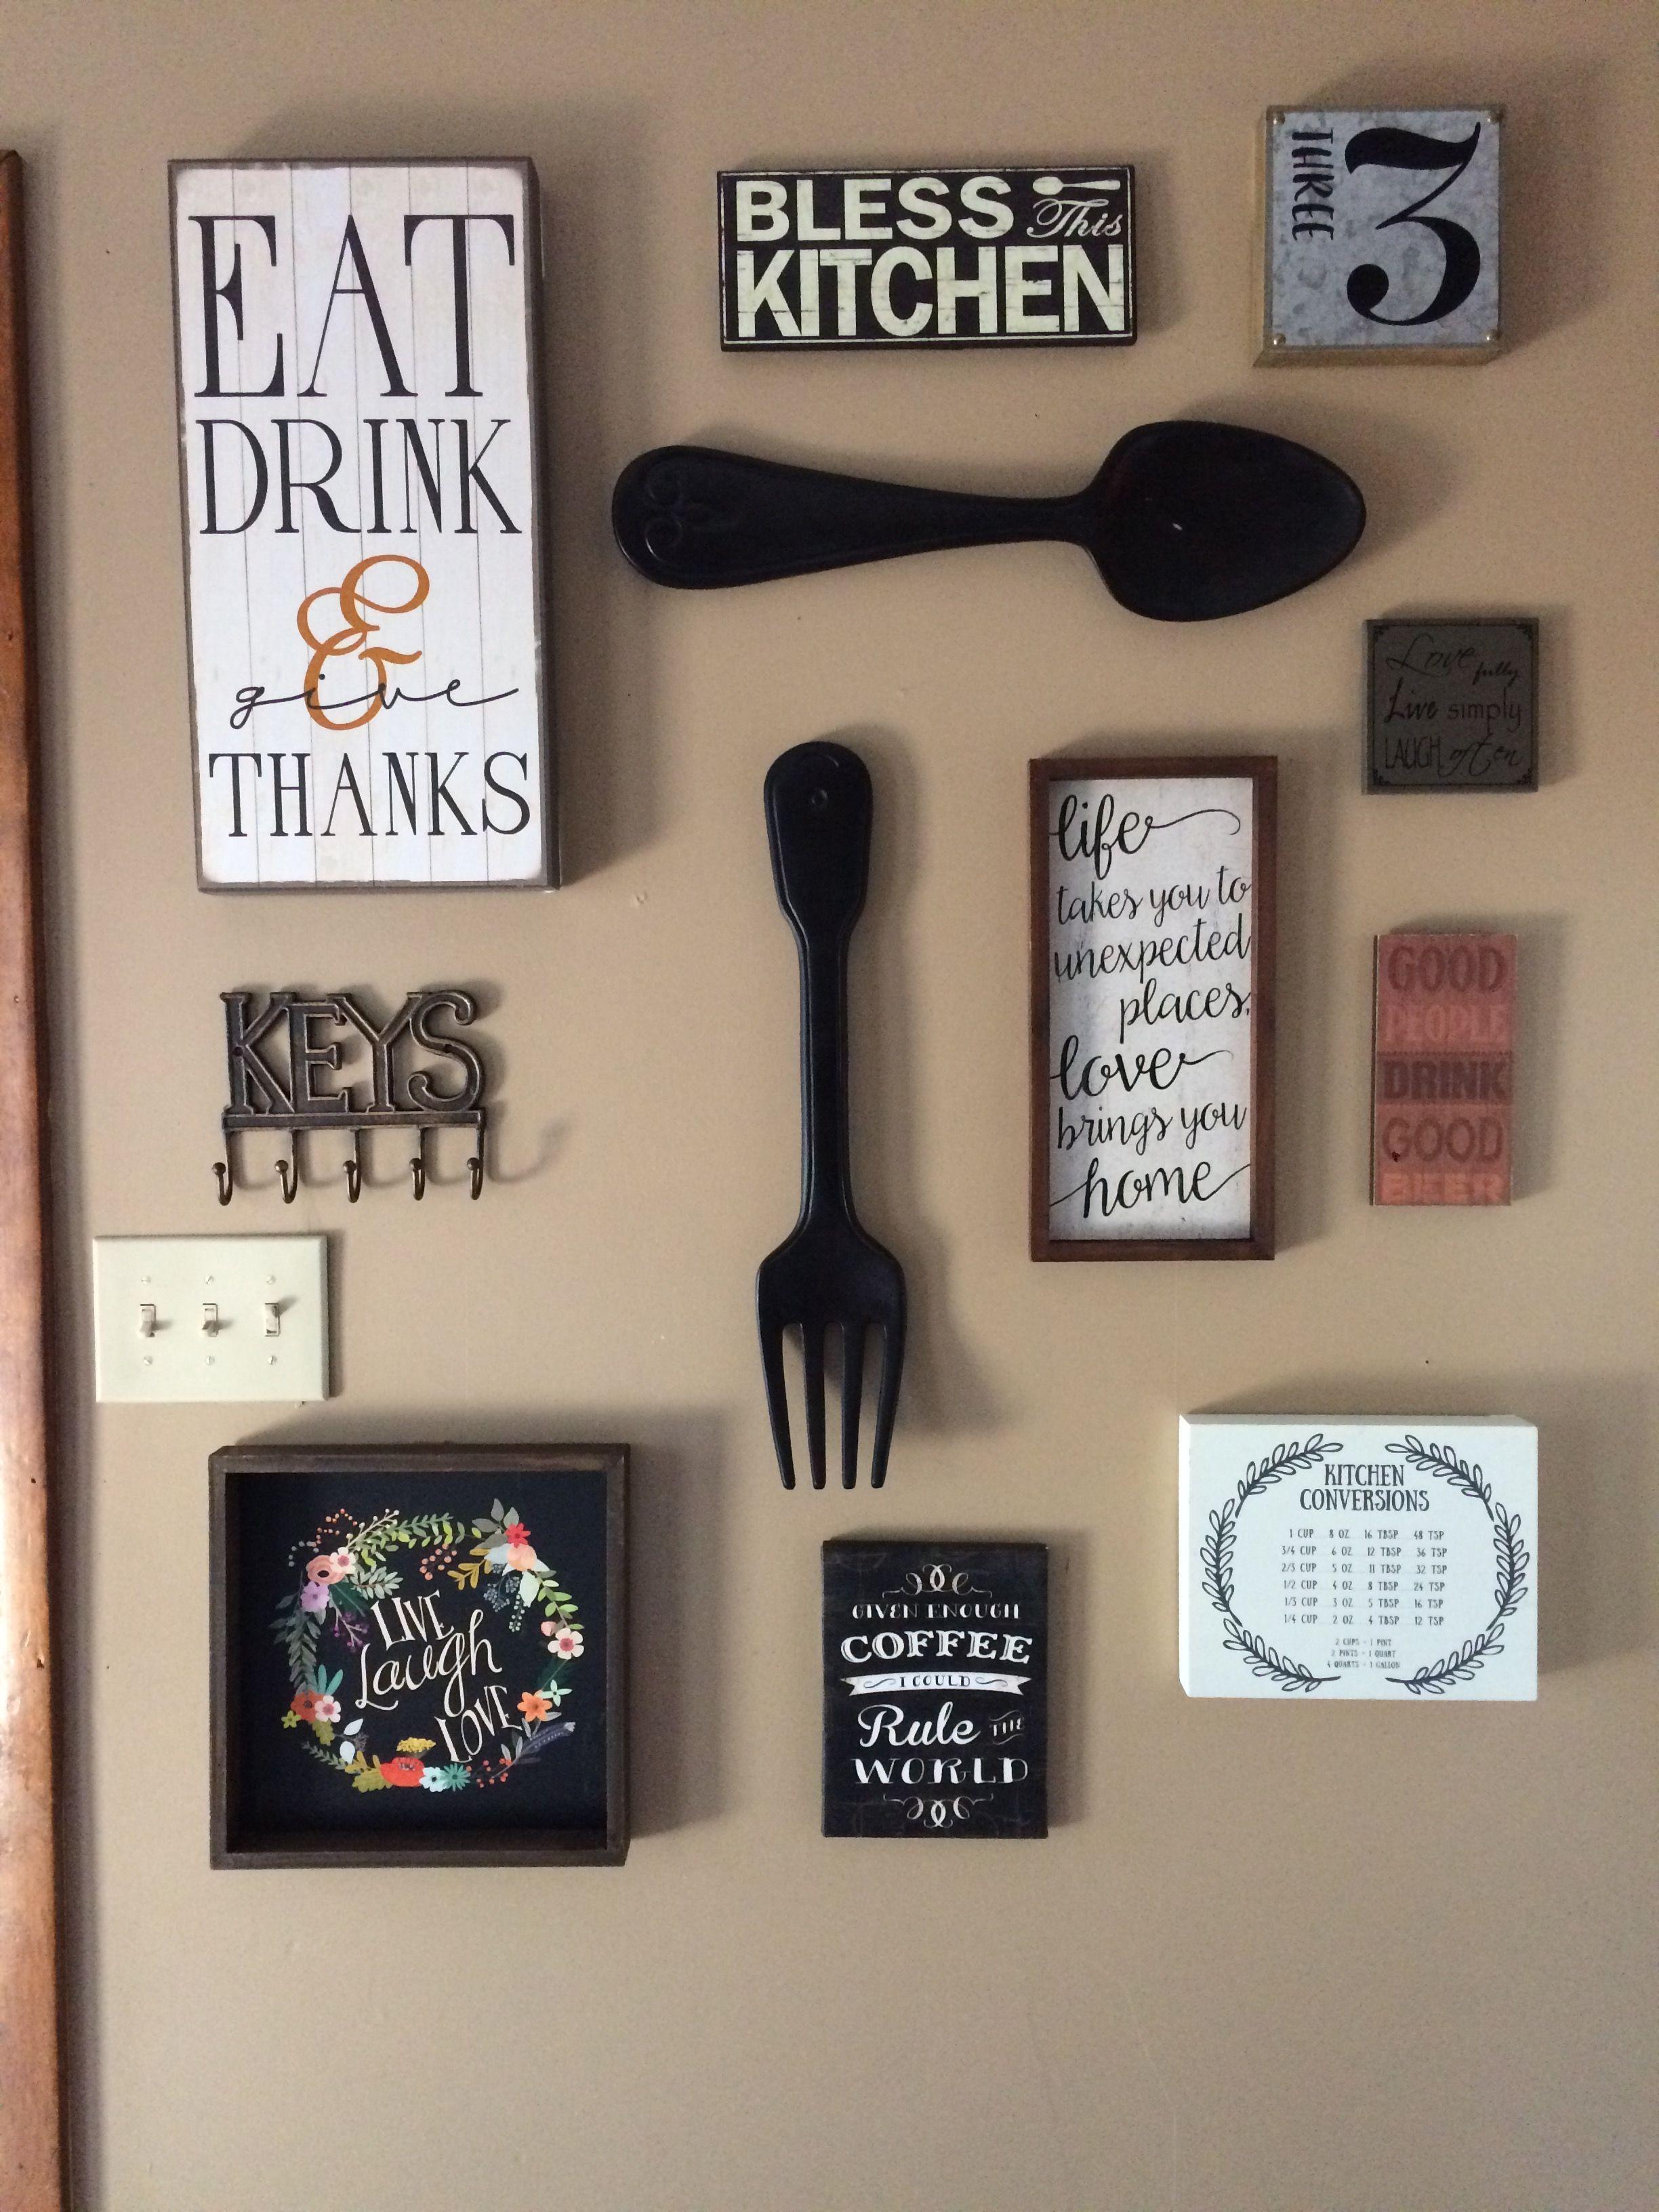 Petty Country Kitchen Ideas Advice 2517556040